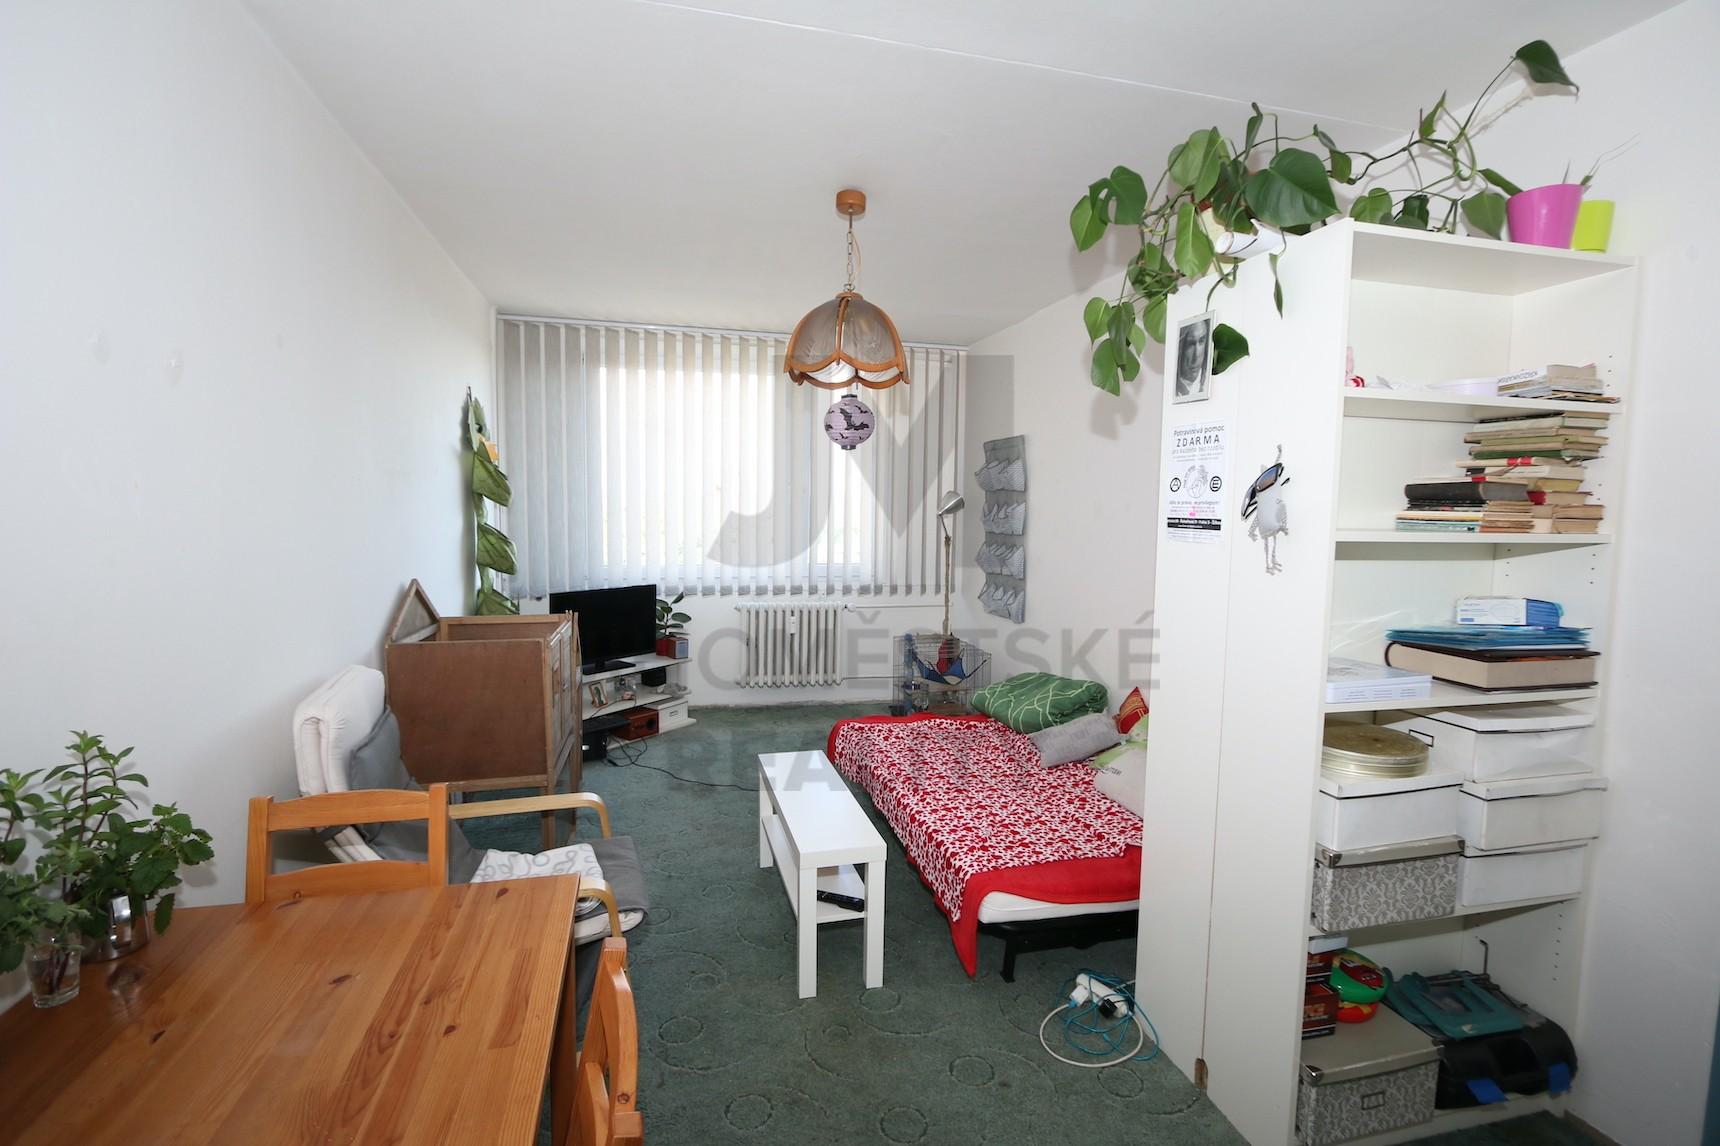 PRODEJ BYTU 2+kk, Steinerova, Praha 4 - Háje